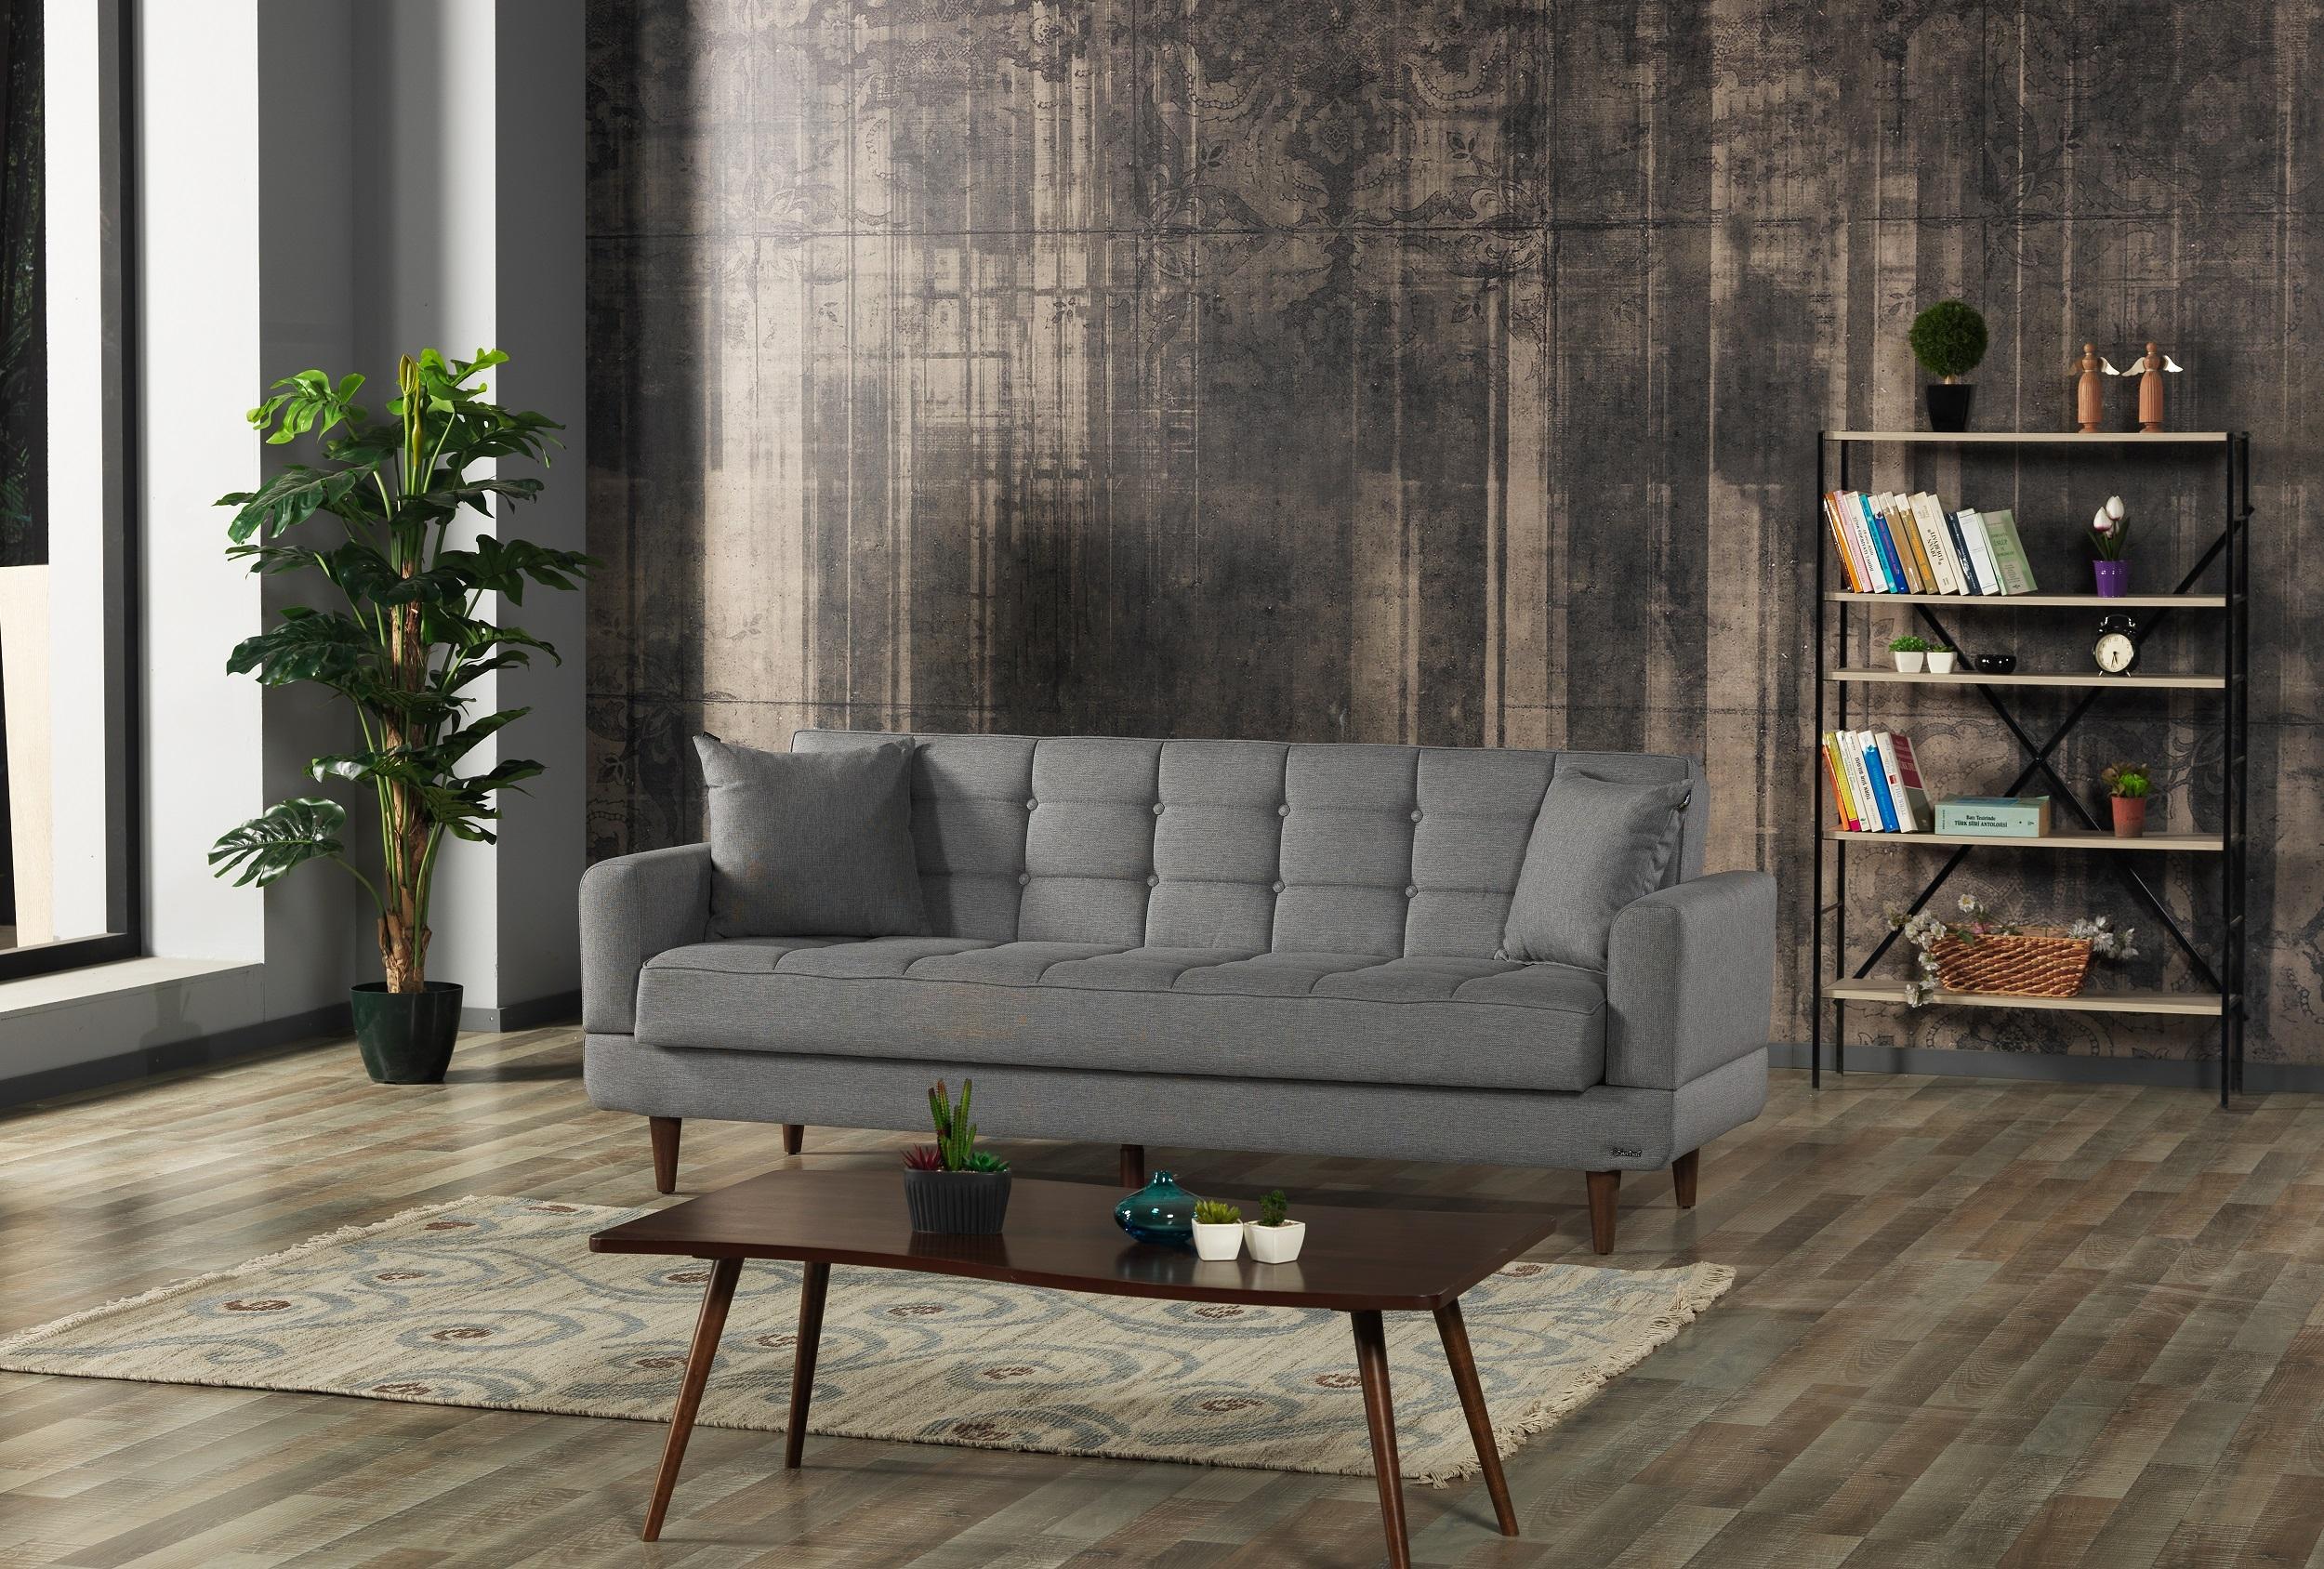 Canapea extensibila cu lada de depozitare, tapitata cu stofa 3 locuri New Jersey Gri, l220xA84xH86 cm